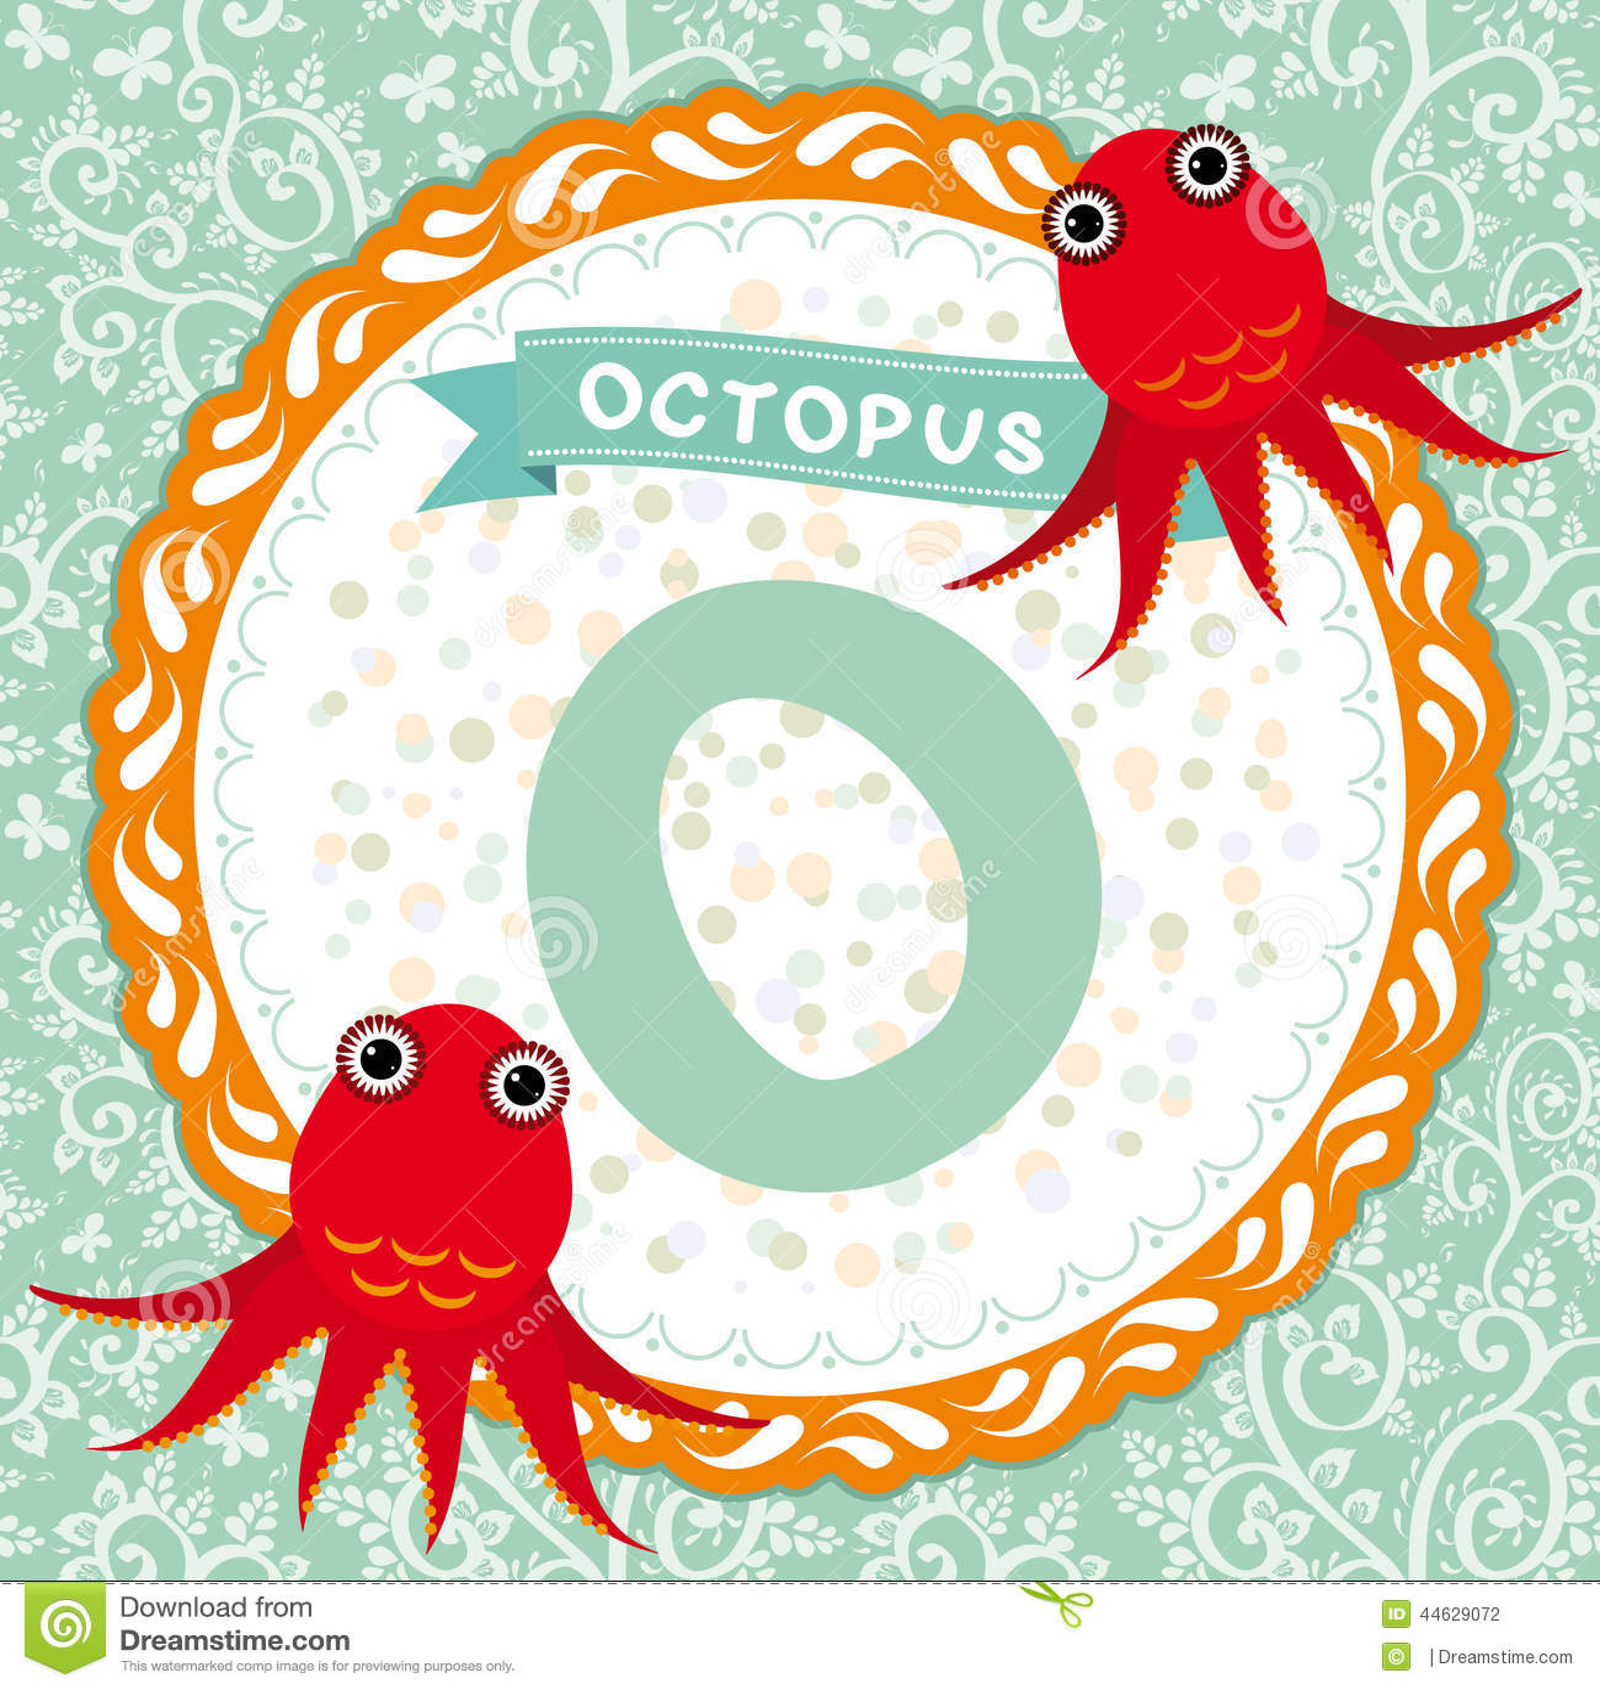 abc儿童:o是鲸鱼动物的英语字母表.飞翔吧章鱼内容简介图片